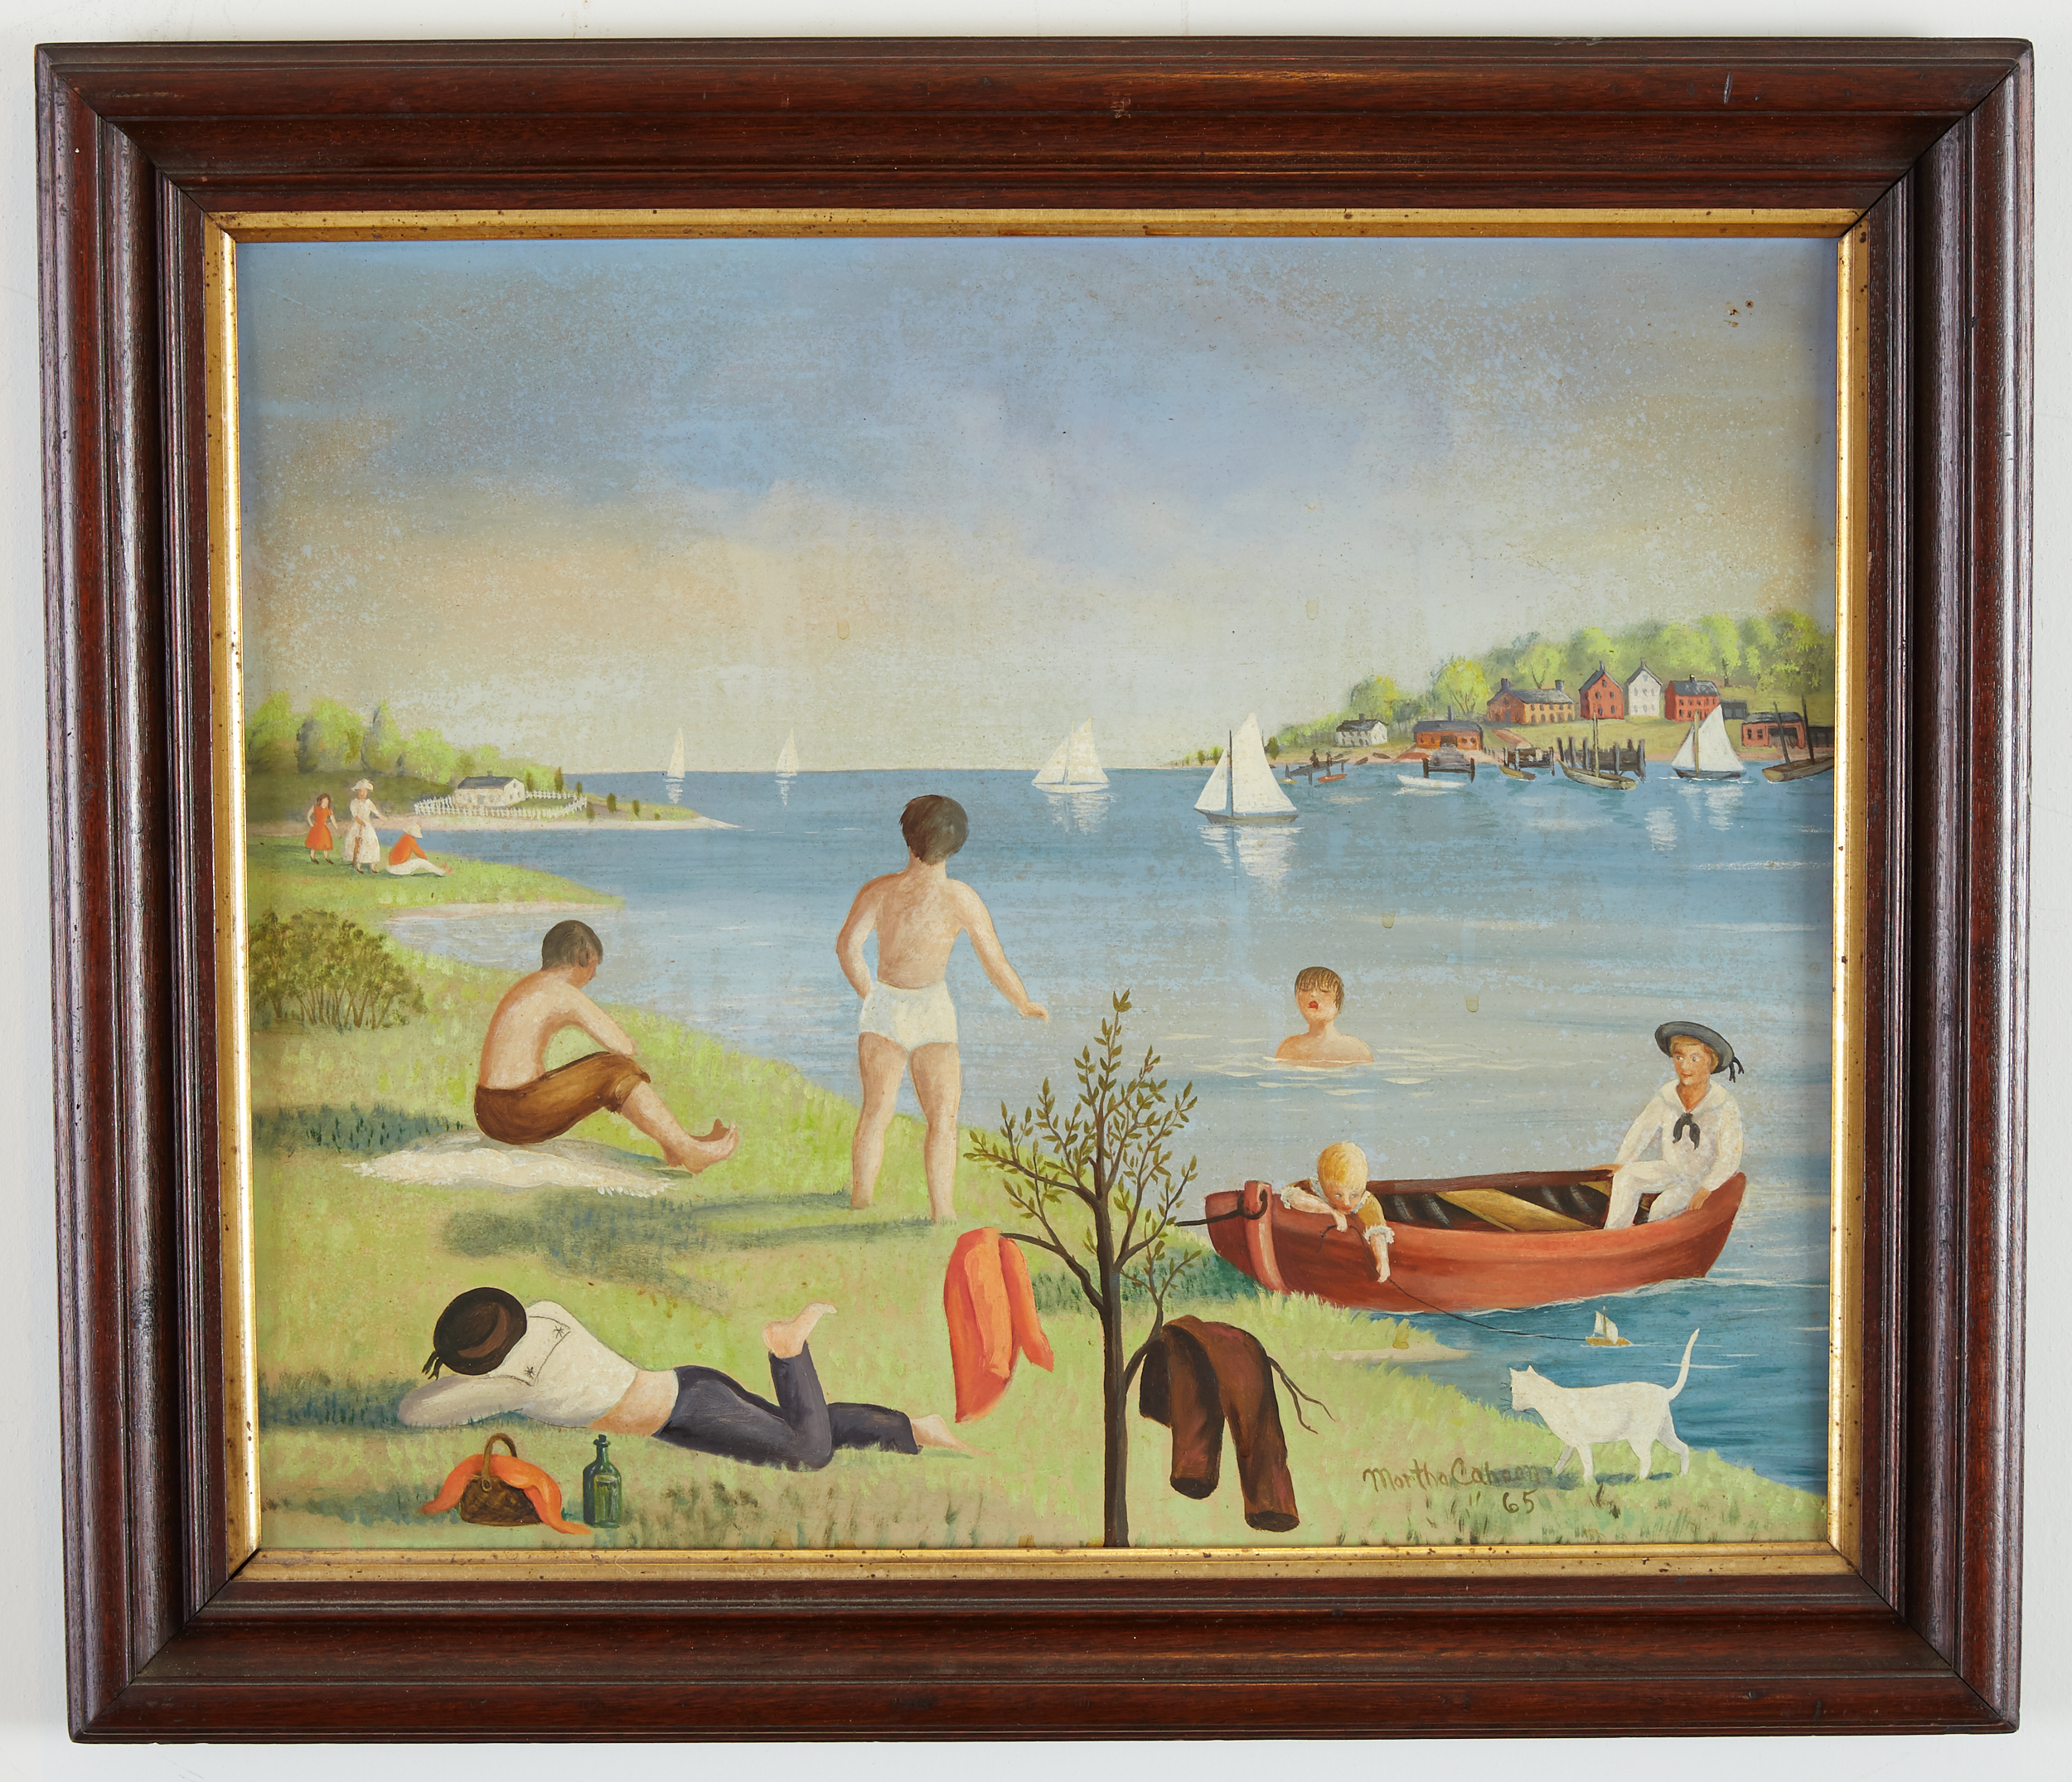 Lot 33 - Martha Cahoon Summertime Oil on Masonite